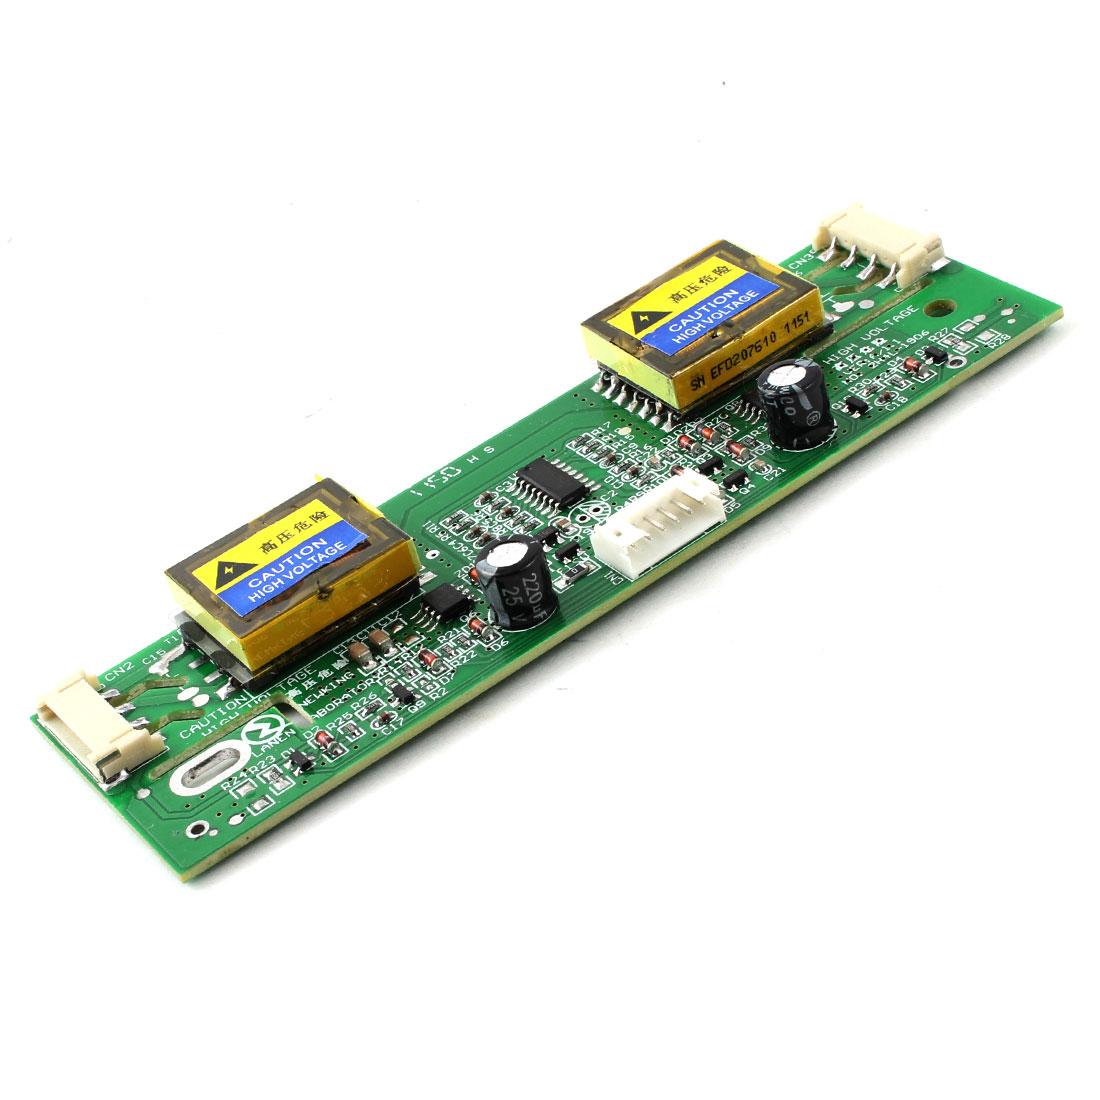 "LCD Monitor Universal CCFL Inverter 10-28V 4 Lamp for 15-22"" Widescreen"